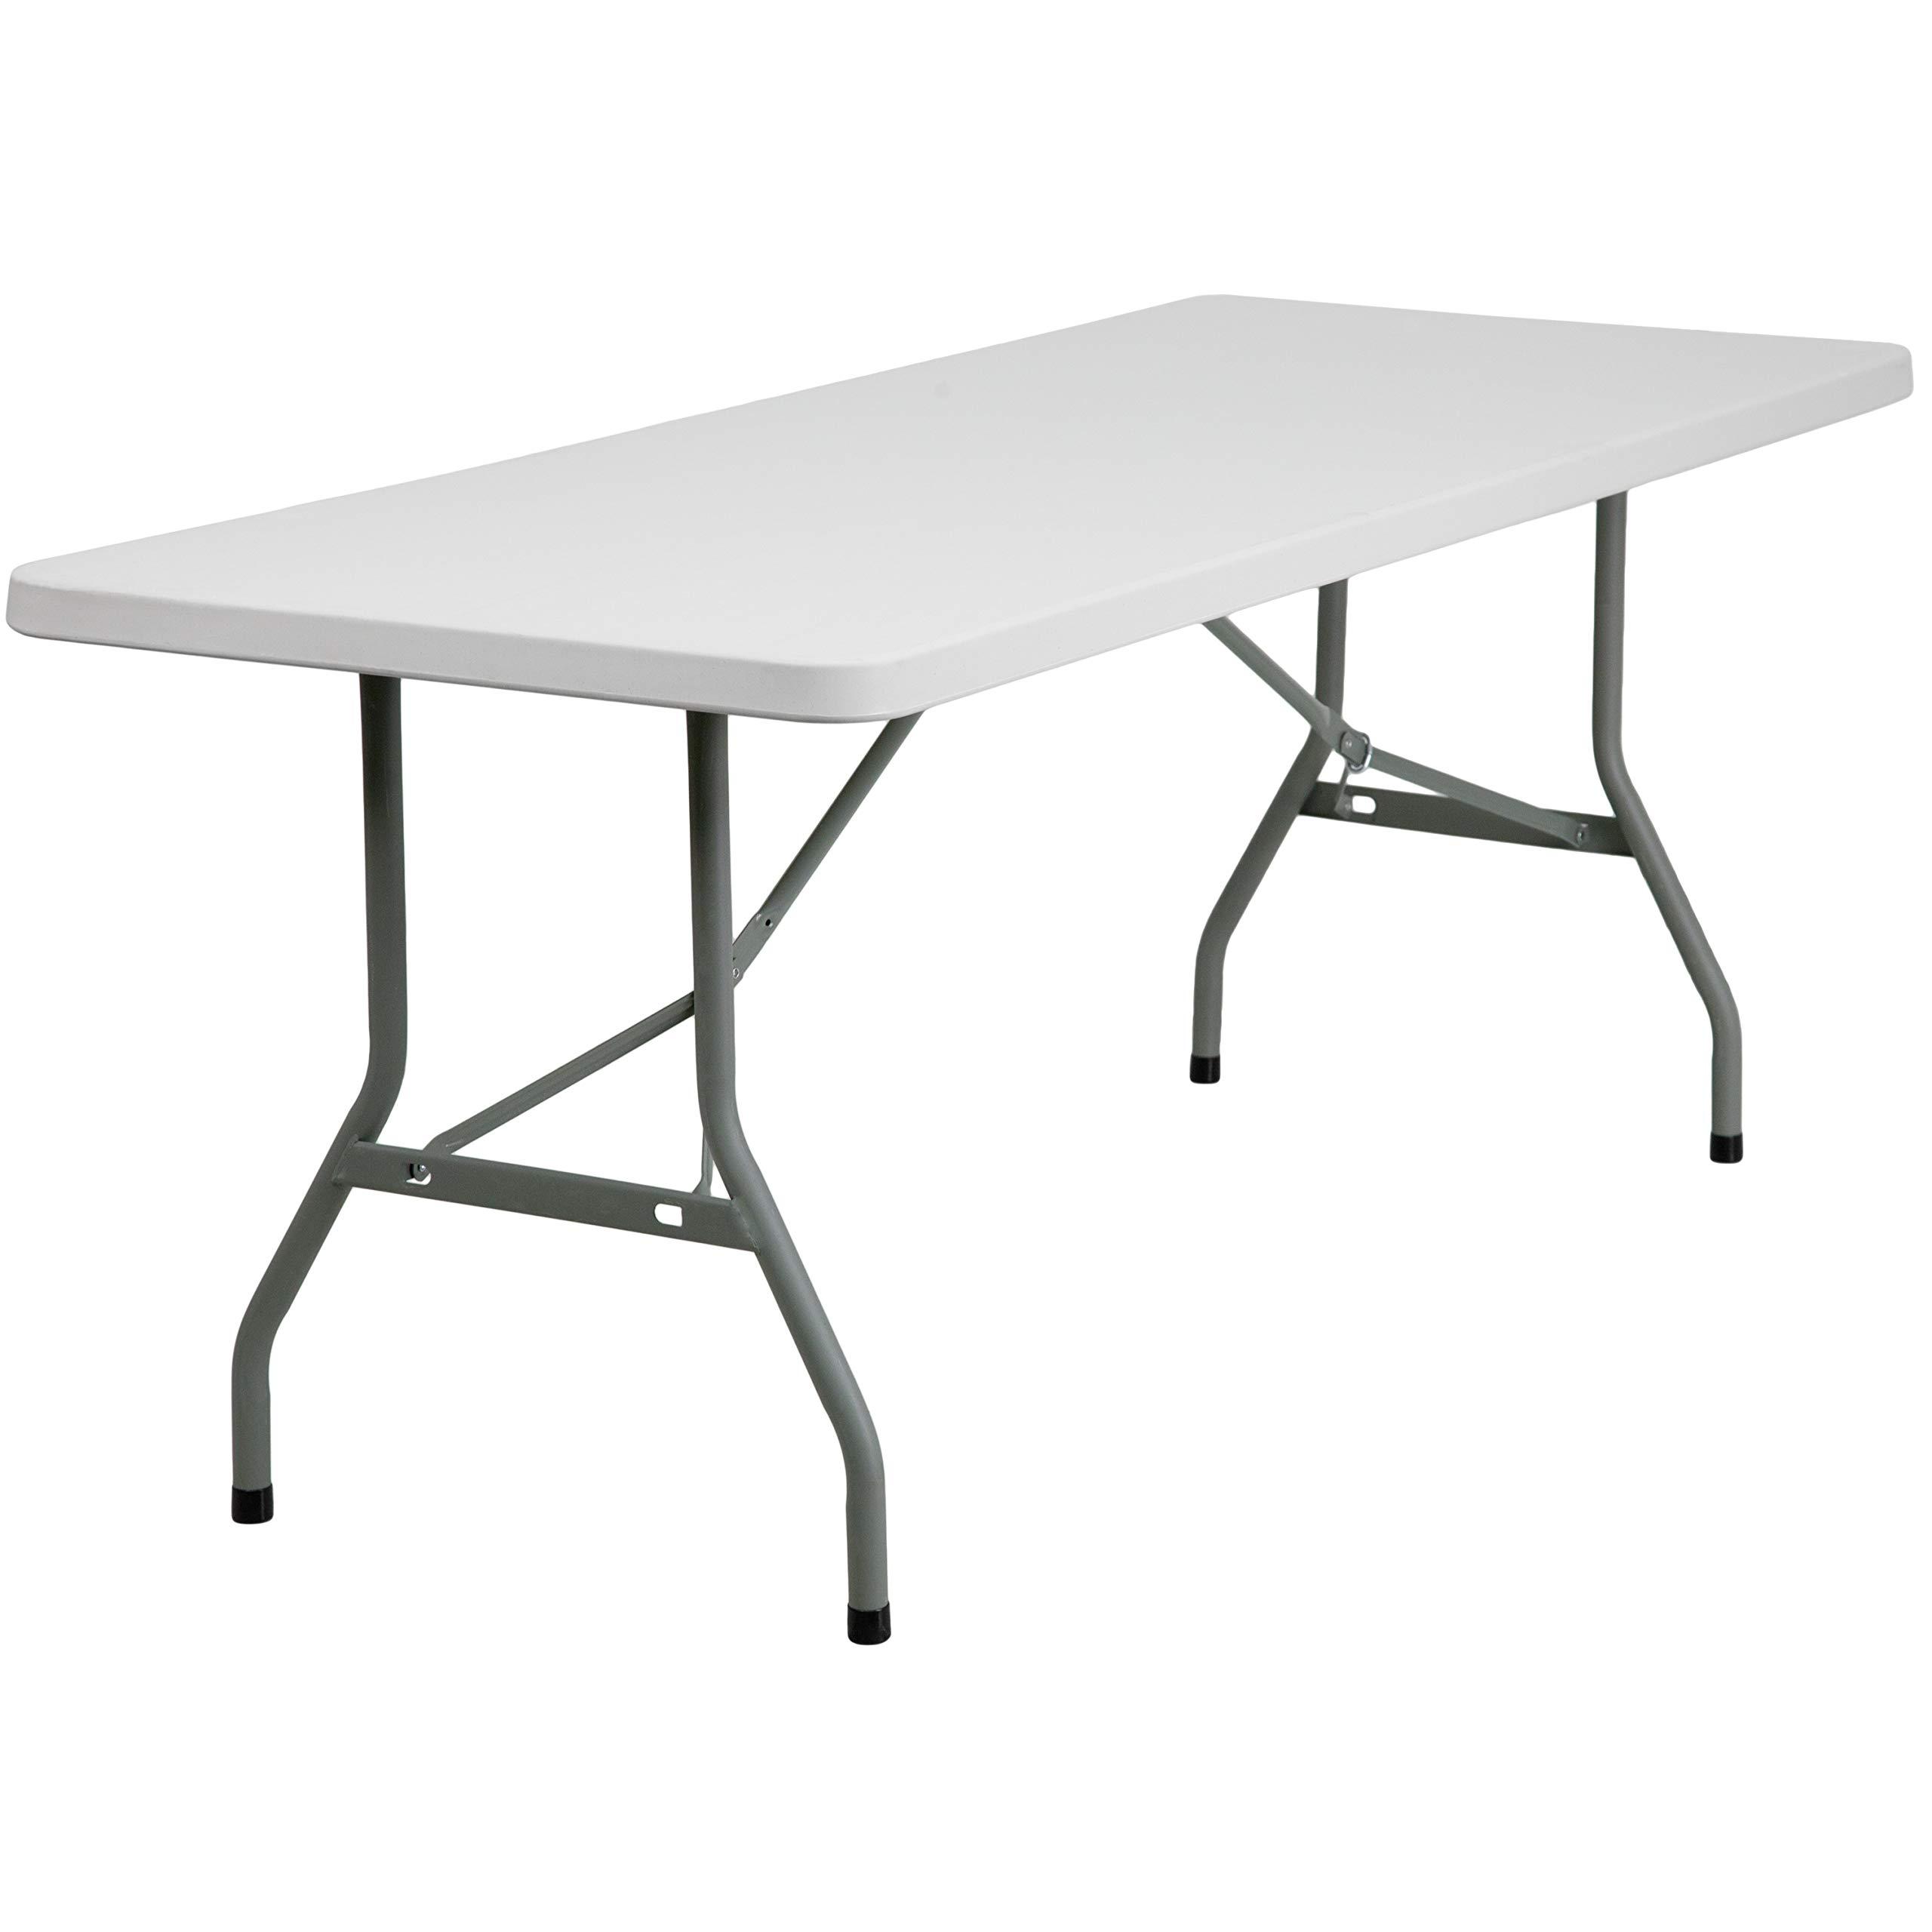 Flash Furniture 6-Foot Granite White Plastic Folding Table by Flash Furniture